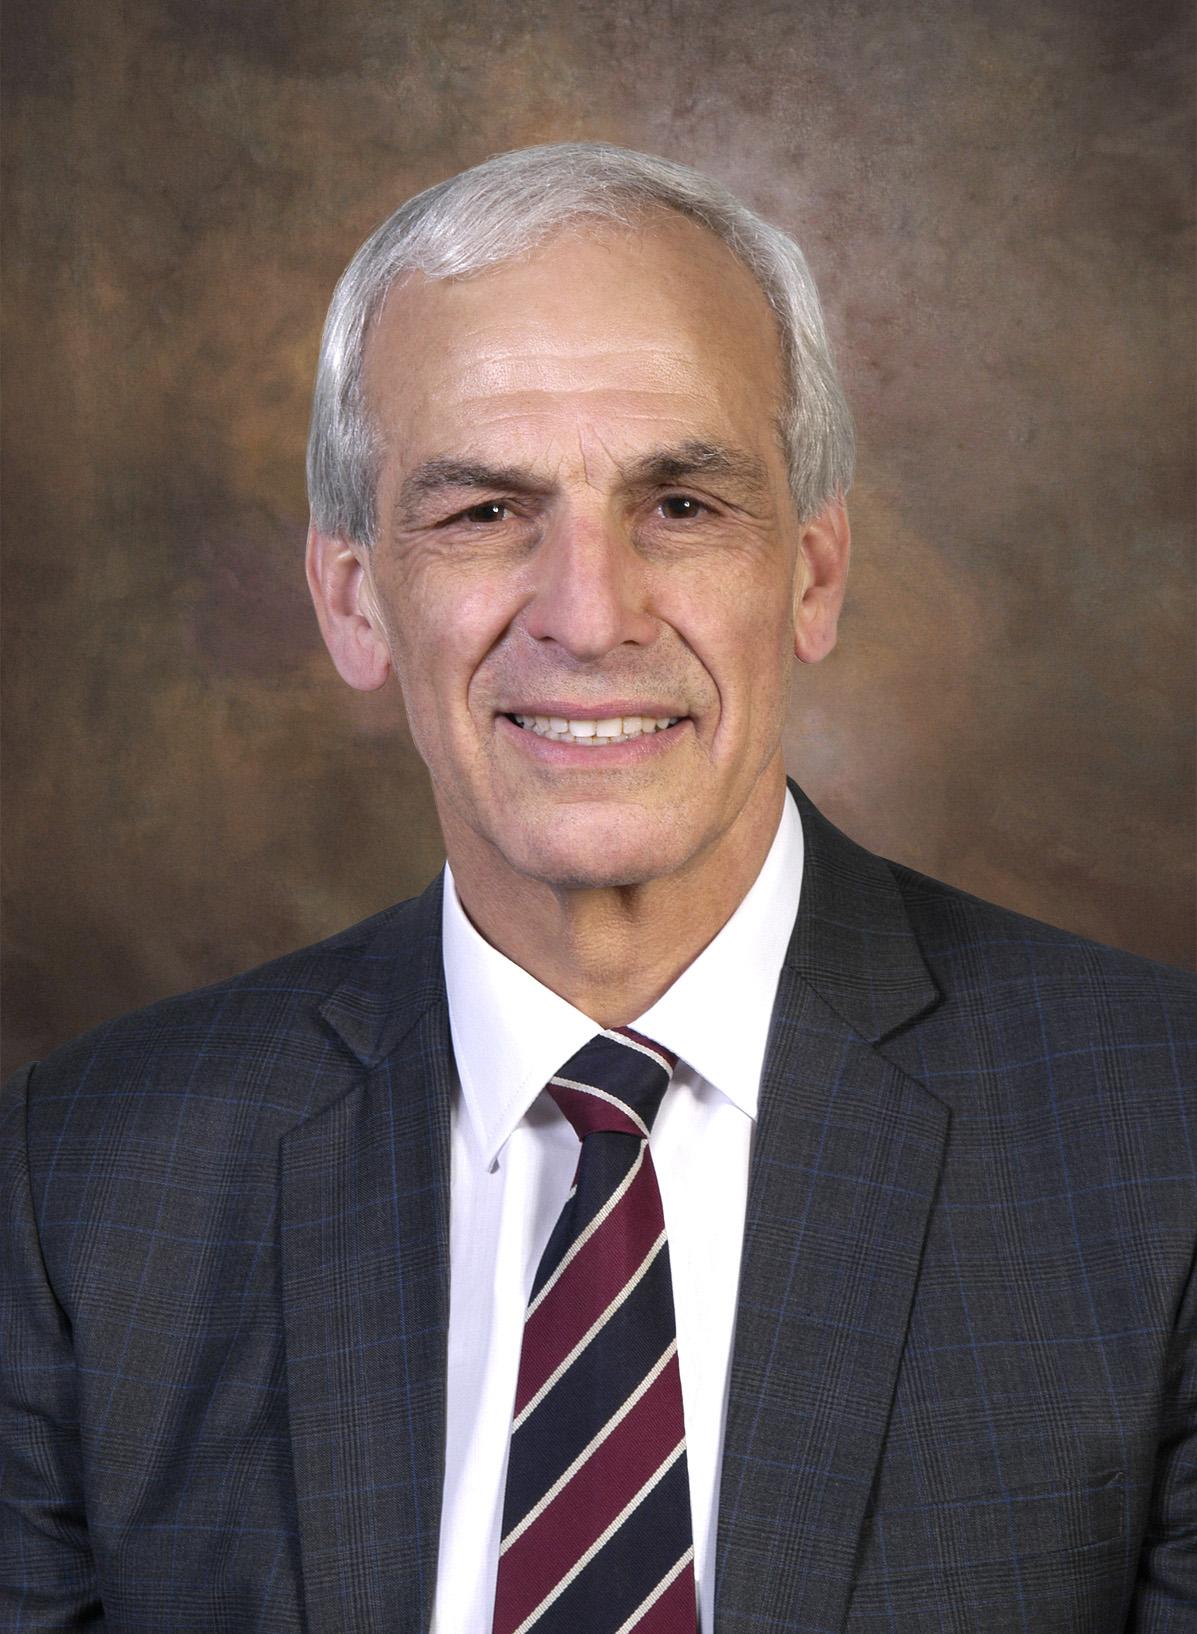 Professor Hugh Bradlow